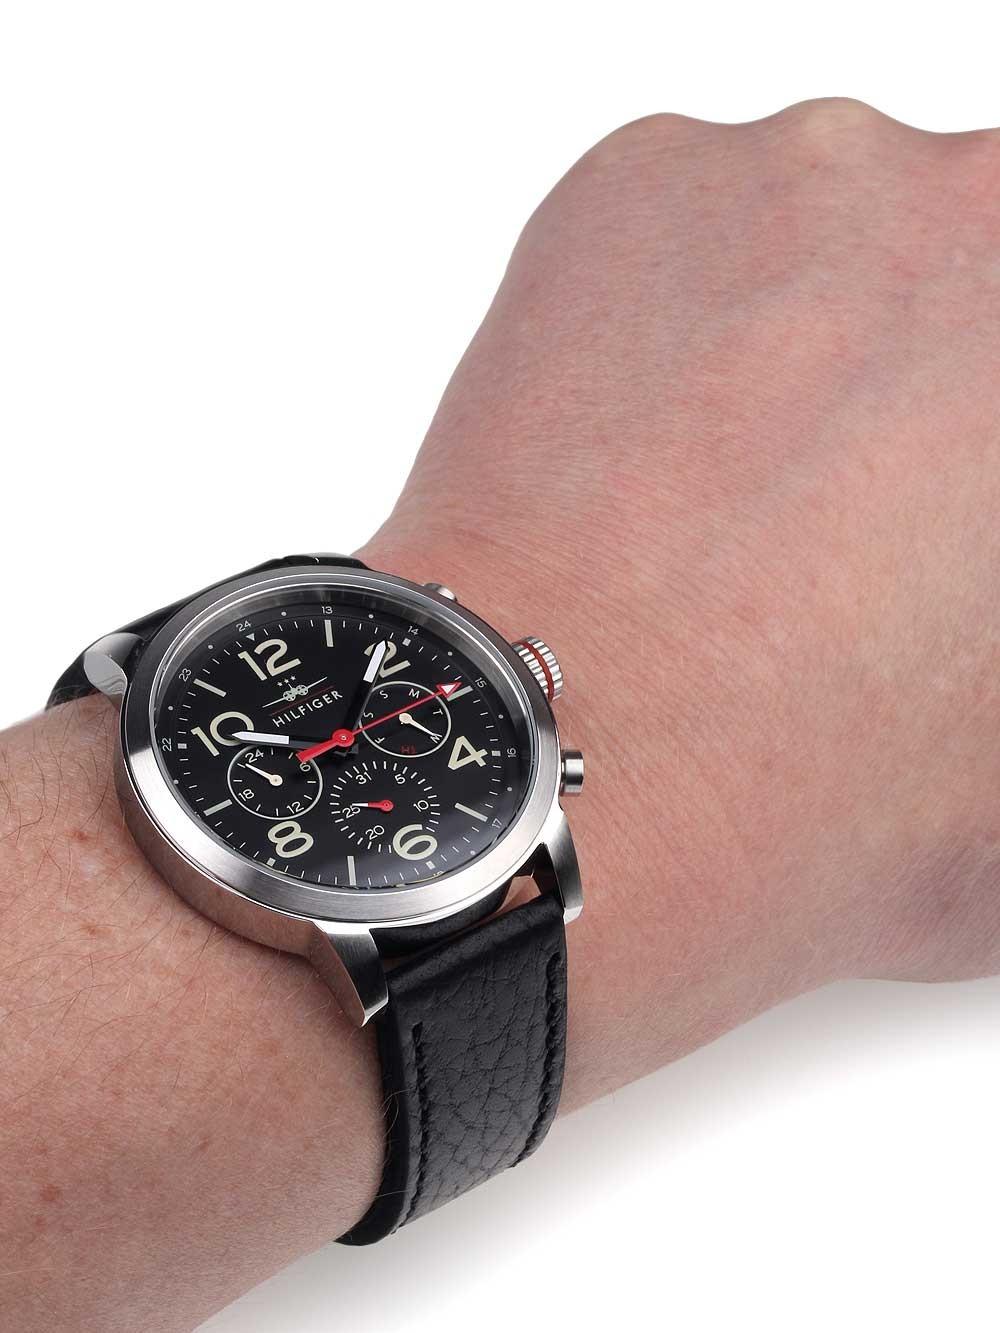 watches chrono12 tommy hilfiger 1791232 herrenuhr. Black Bedroom Furniture Sets. Home Design Ideas